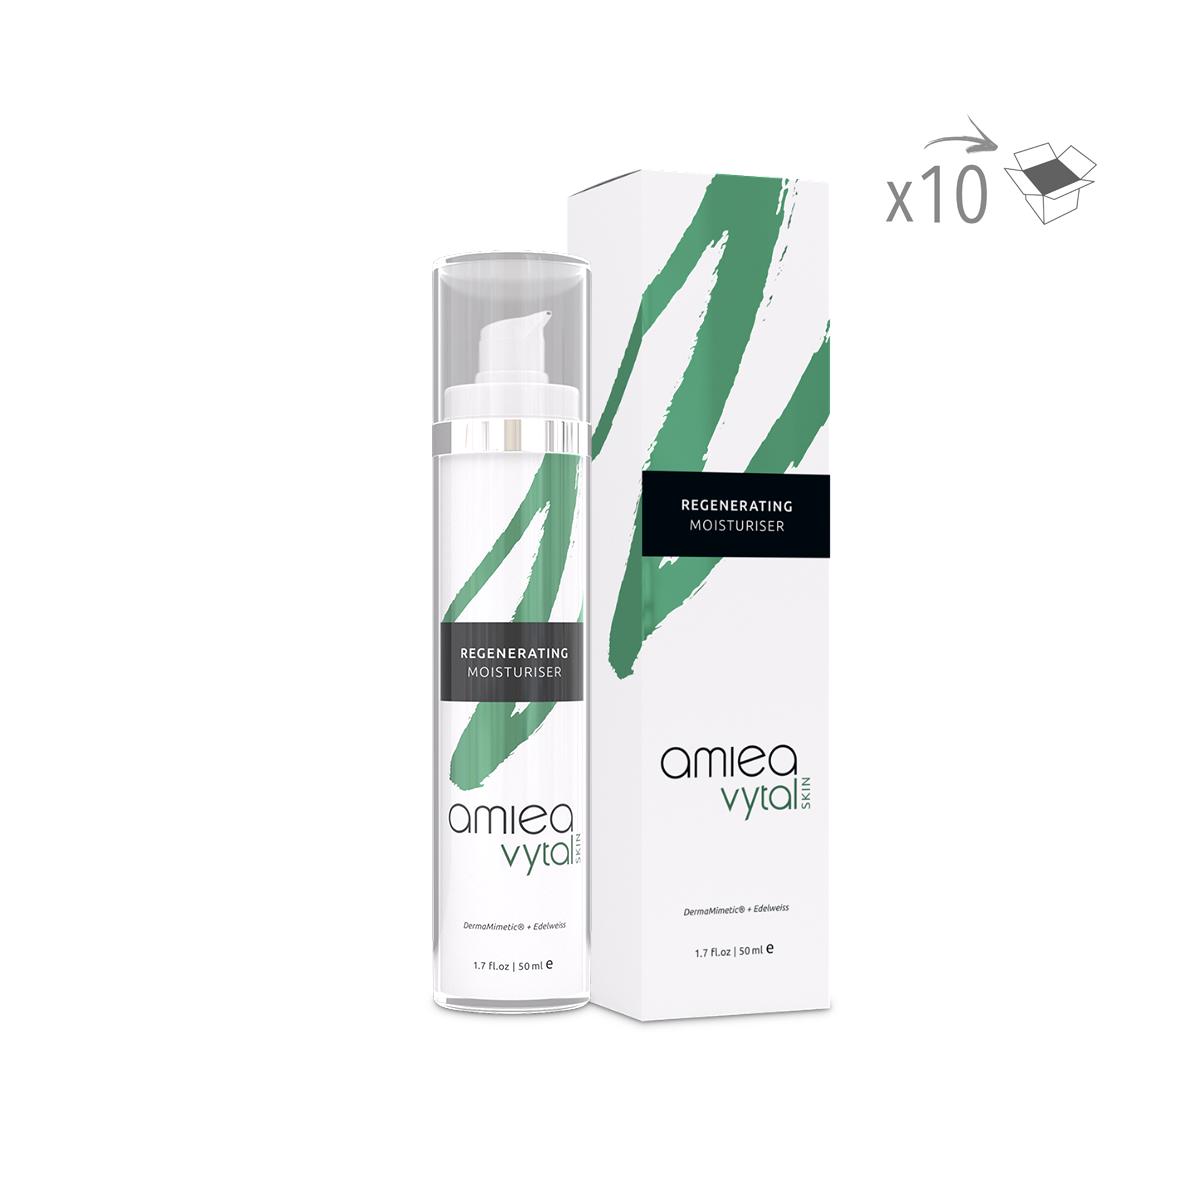 CREME HYDRATANTE ANTI-AGE VYTAL SKIN (50 ml) (x10ml)